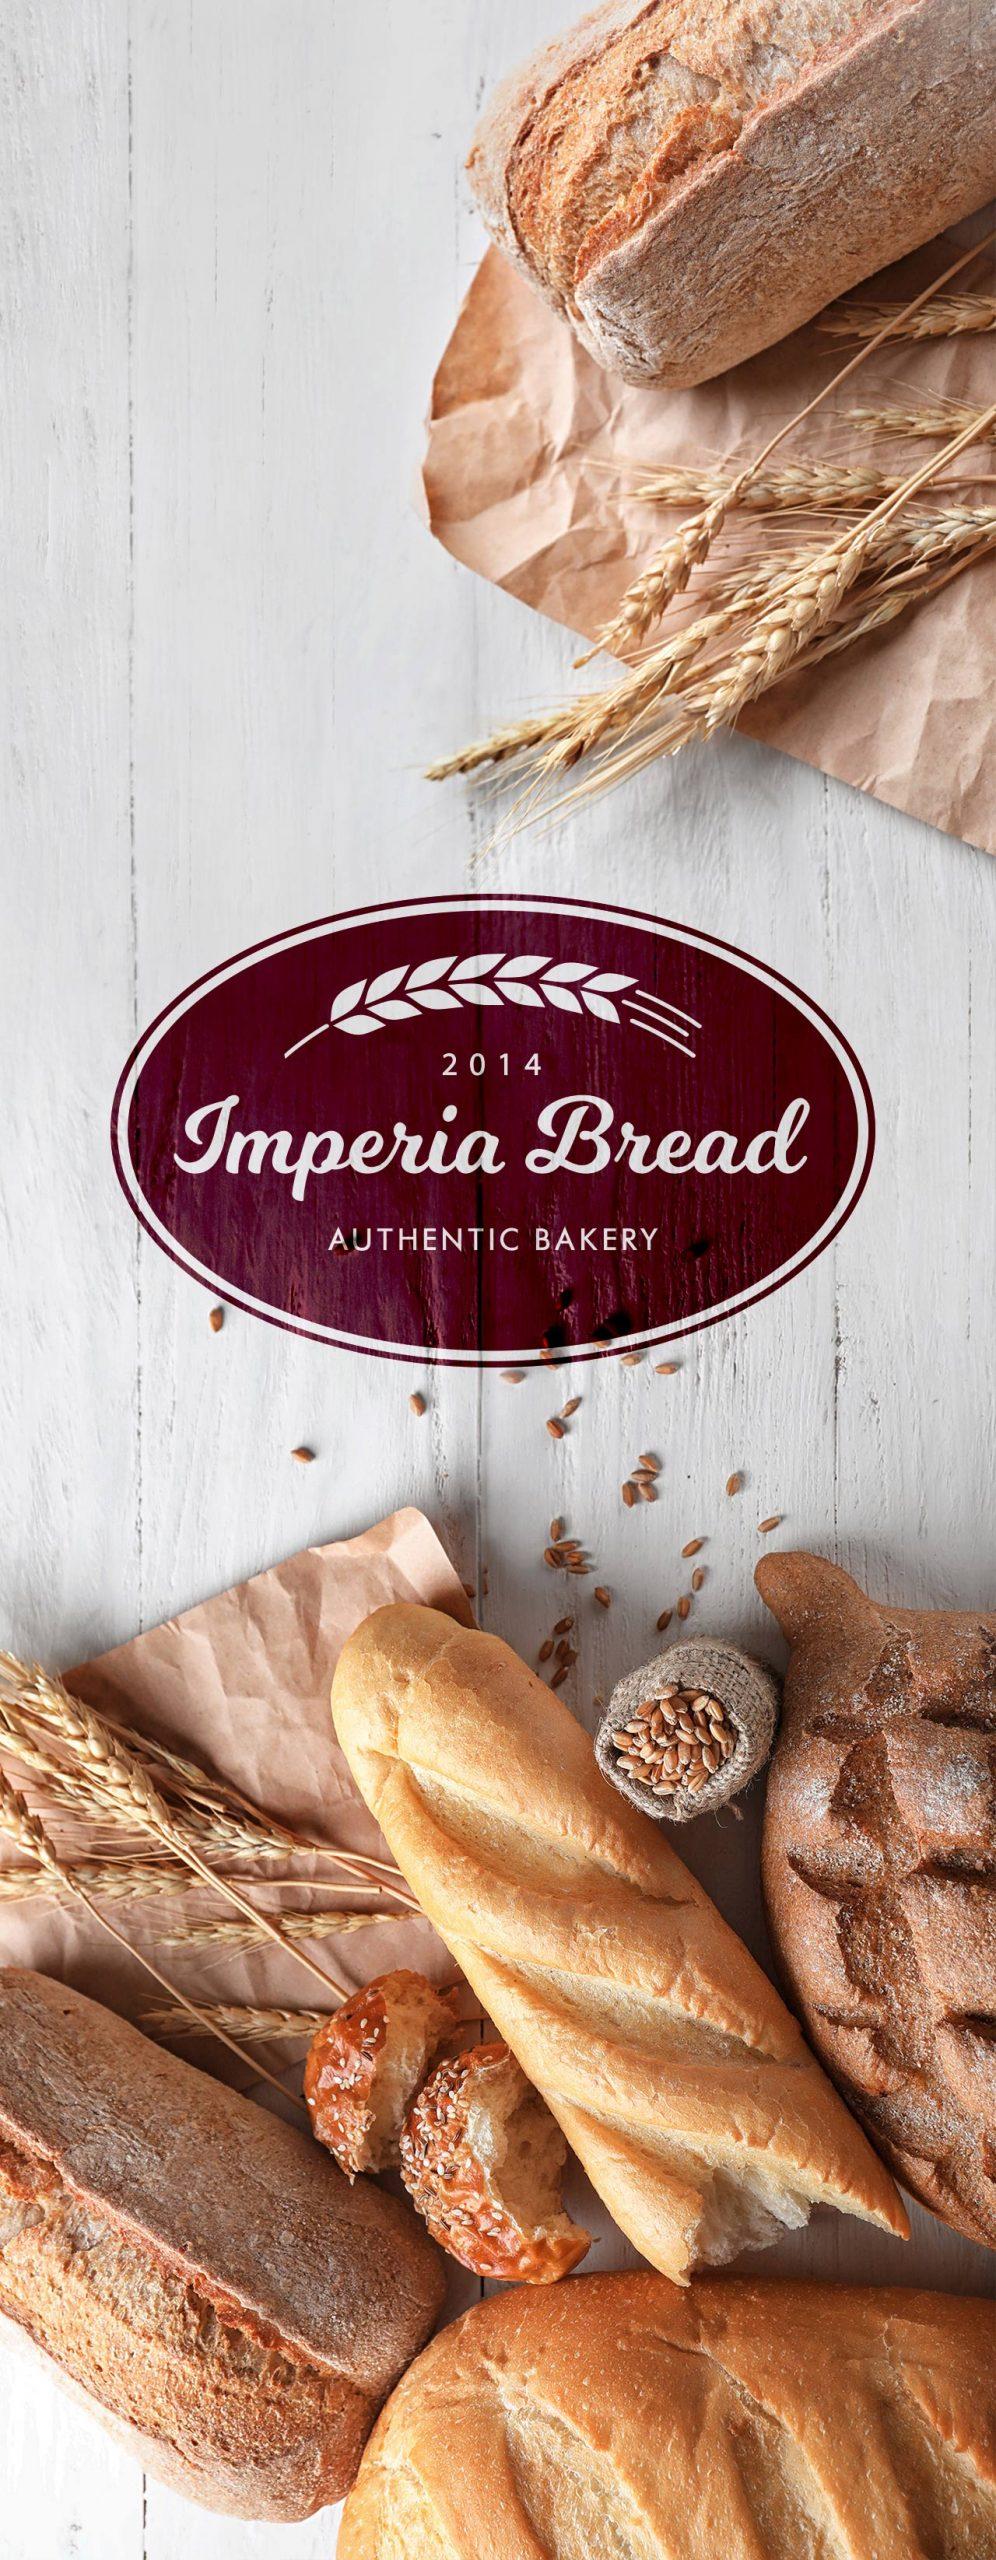 создание логотипа хлебозавода